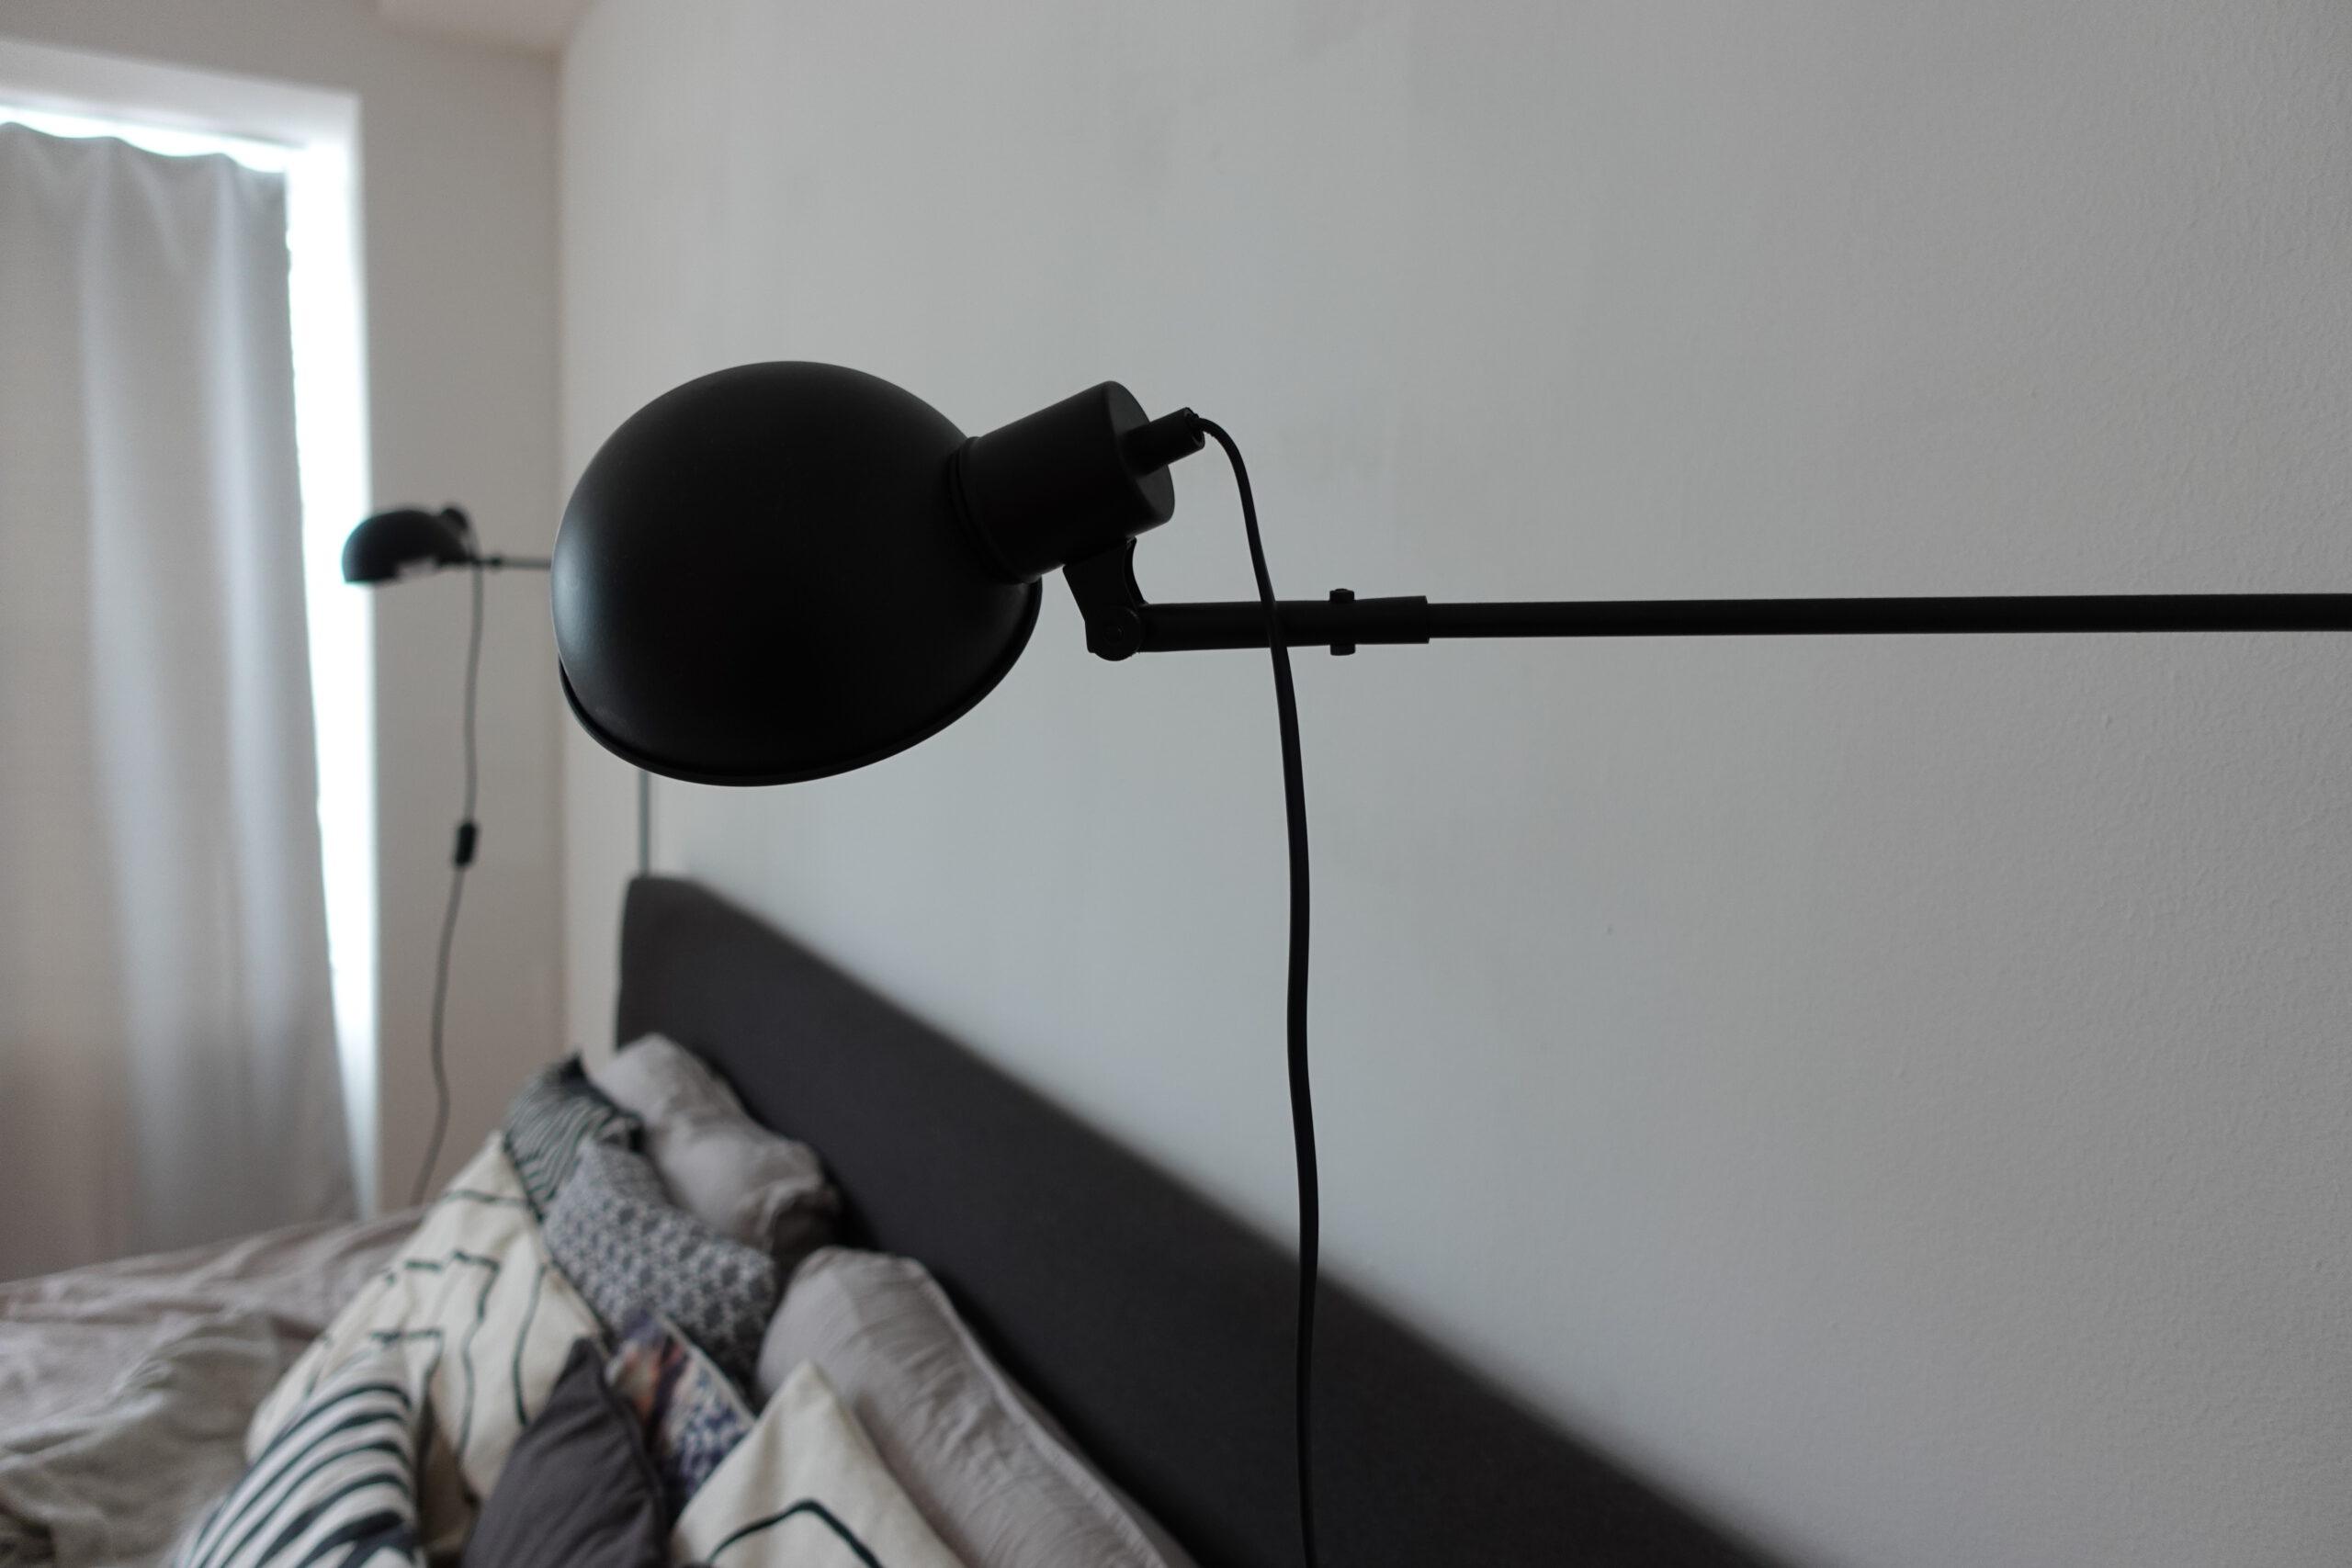 Monoista Wandlampe Upcyceln 09 1 scaled -